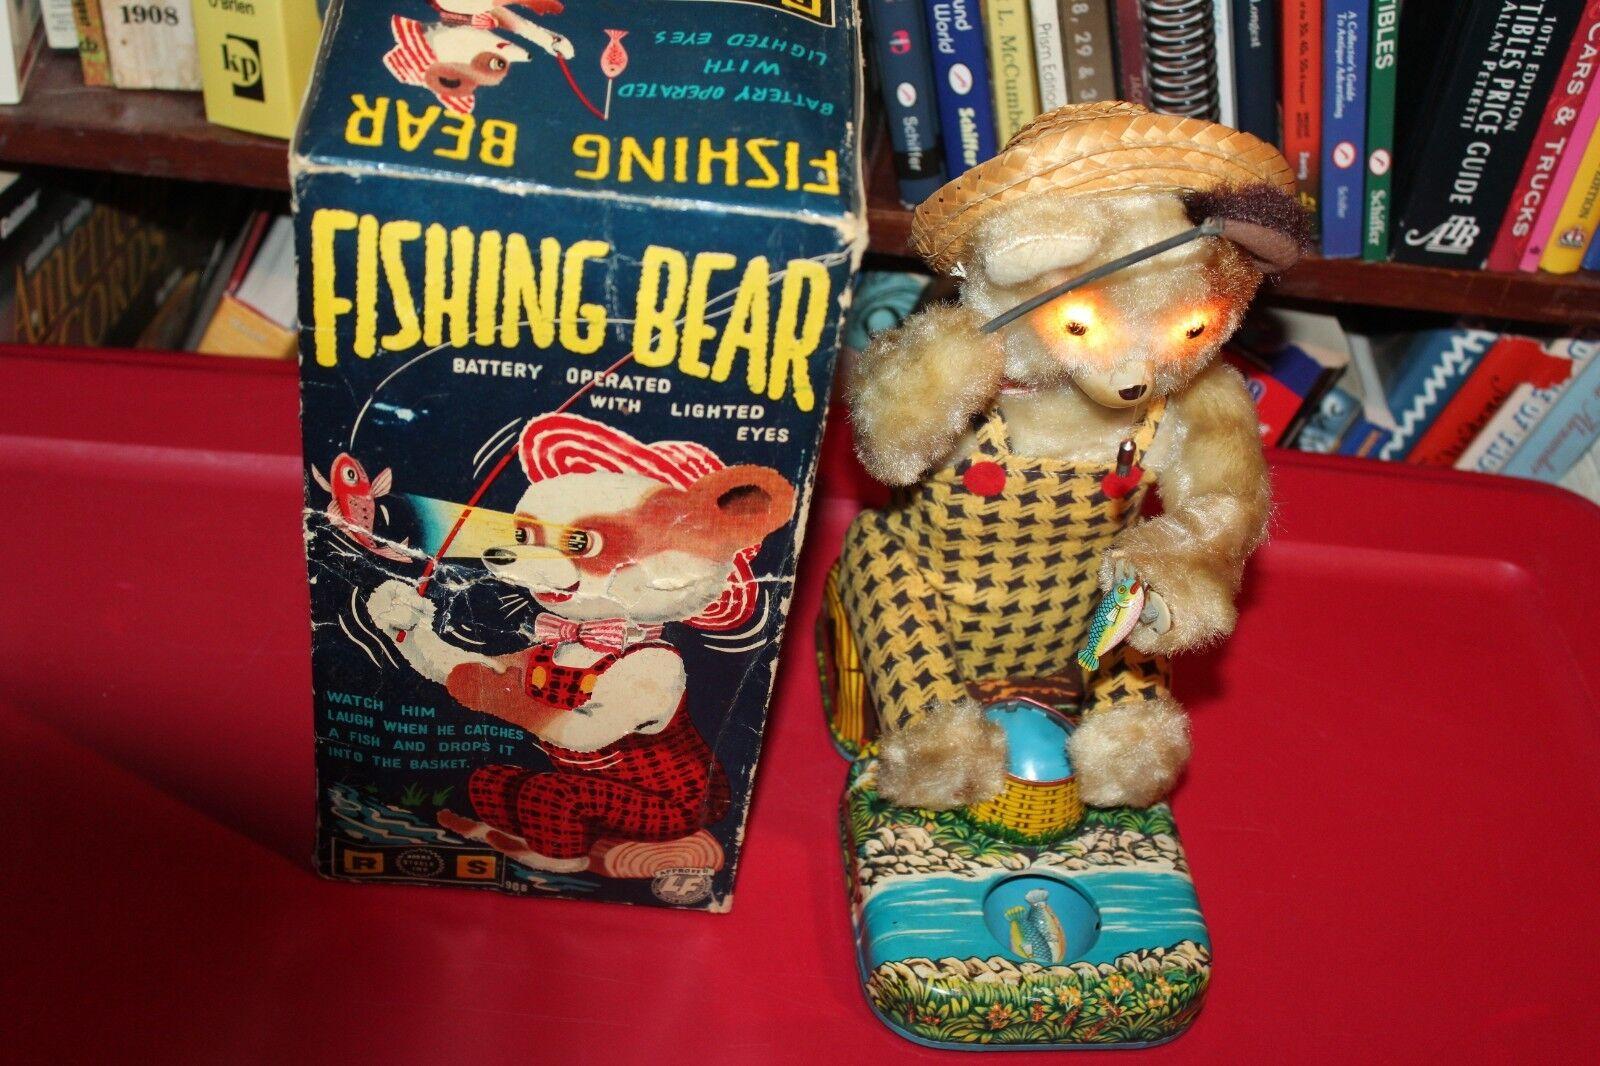 NÄRA VINSALA BATTERIET OPERADES FISKE BEAR I låda